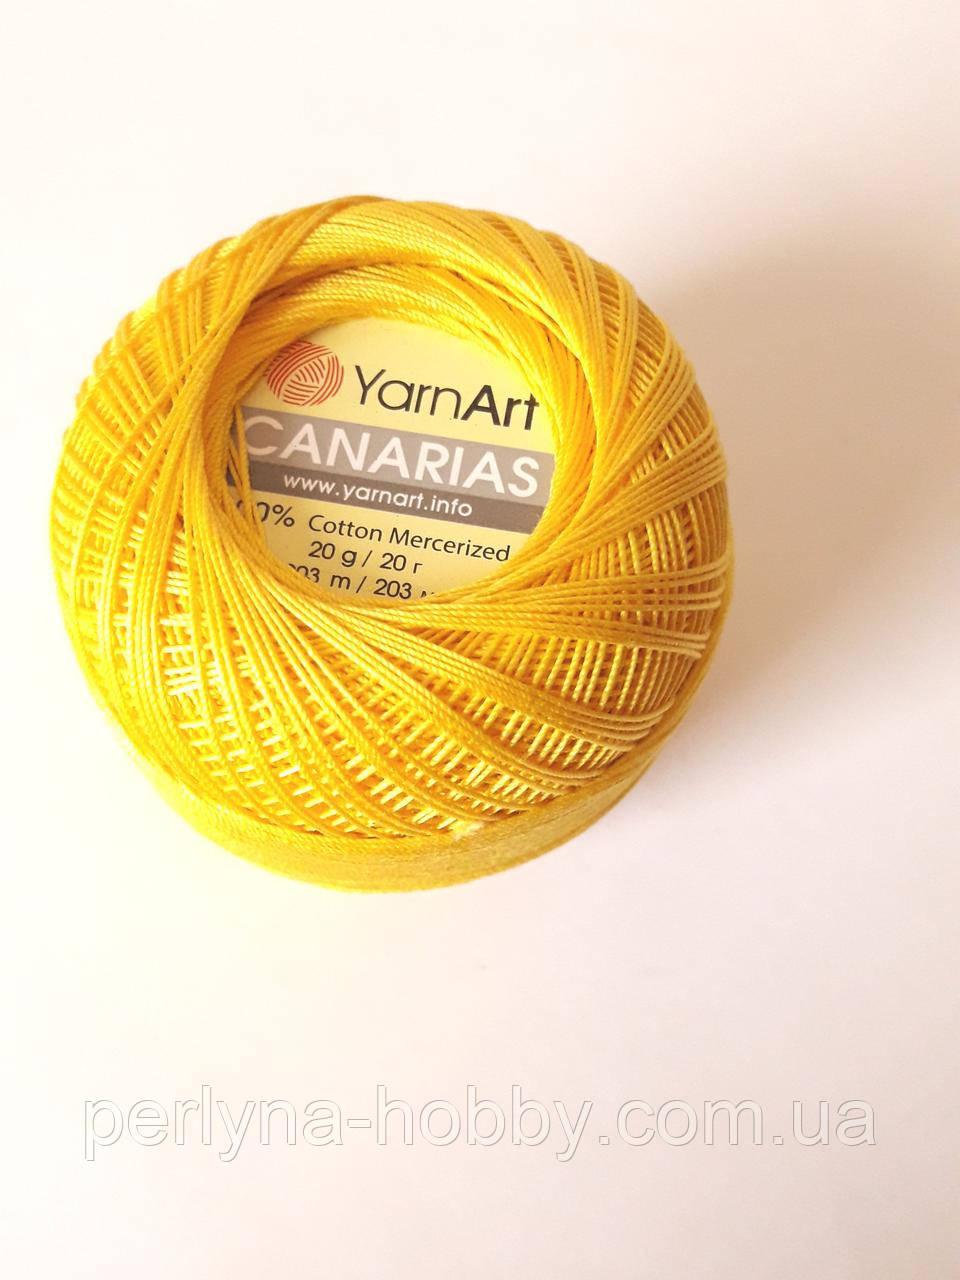 Канаріас Пряжа Canarias YarnArt 100%  жовтий, 1 шт. № 6347